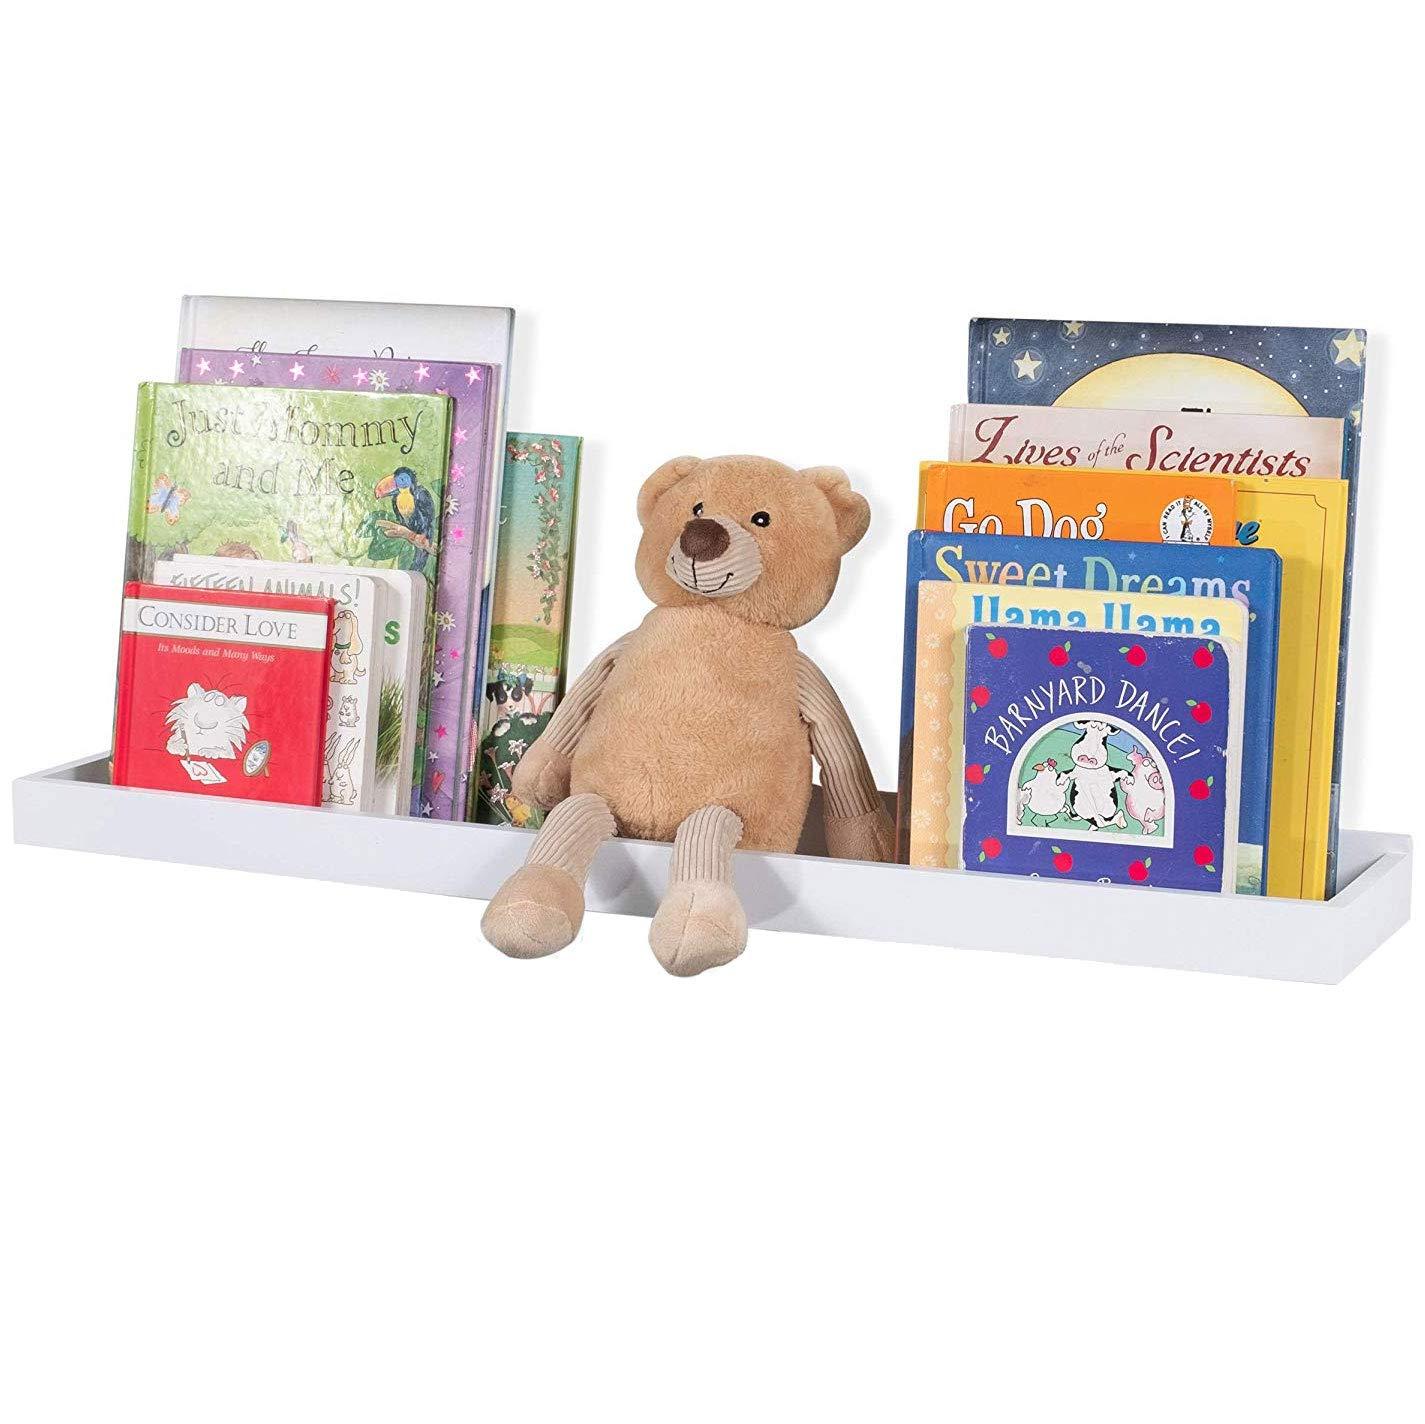 Wallniture Philly White Wall Shelf Kids Room Decor, Floating Book Shelf and Tray Toy Storage Organizer, 23.75